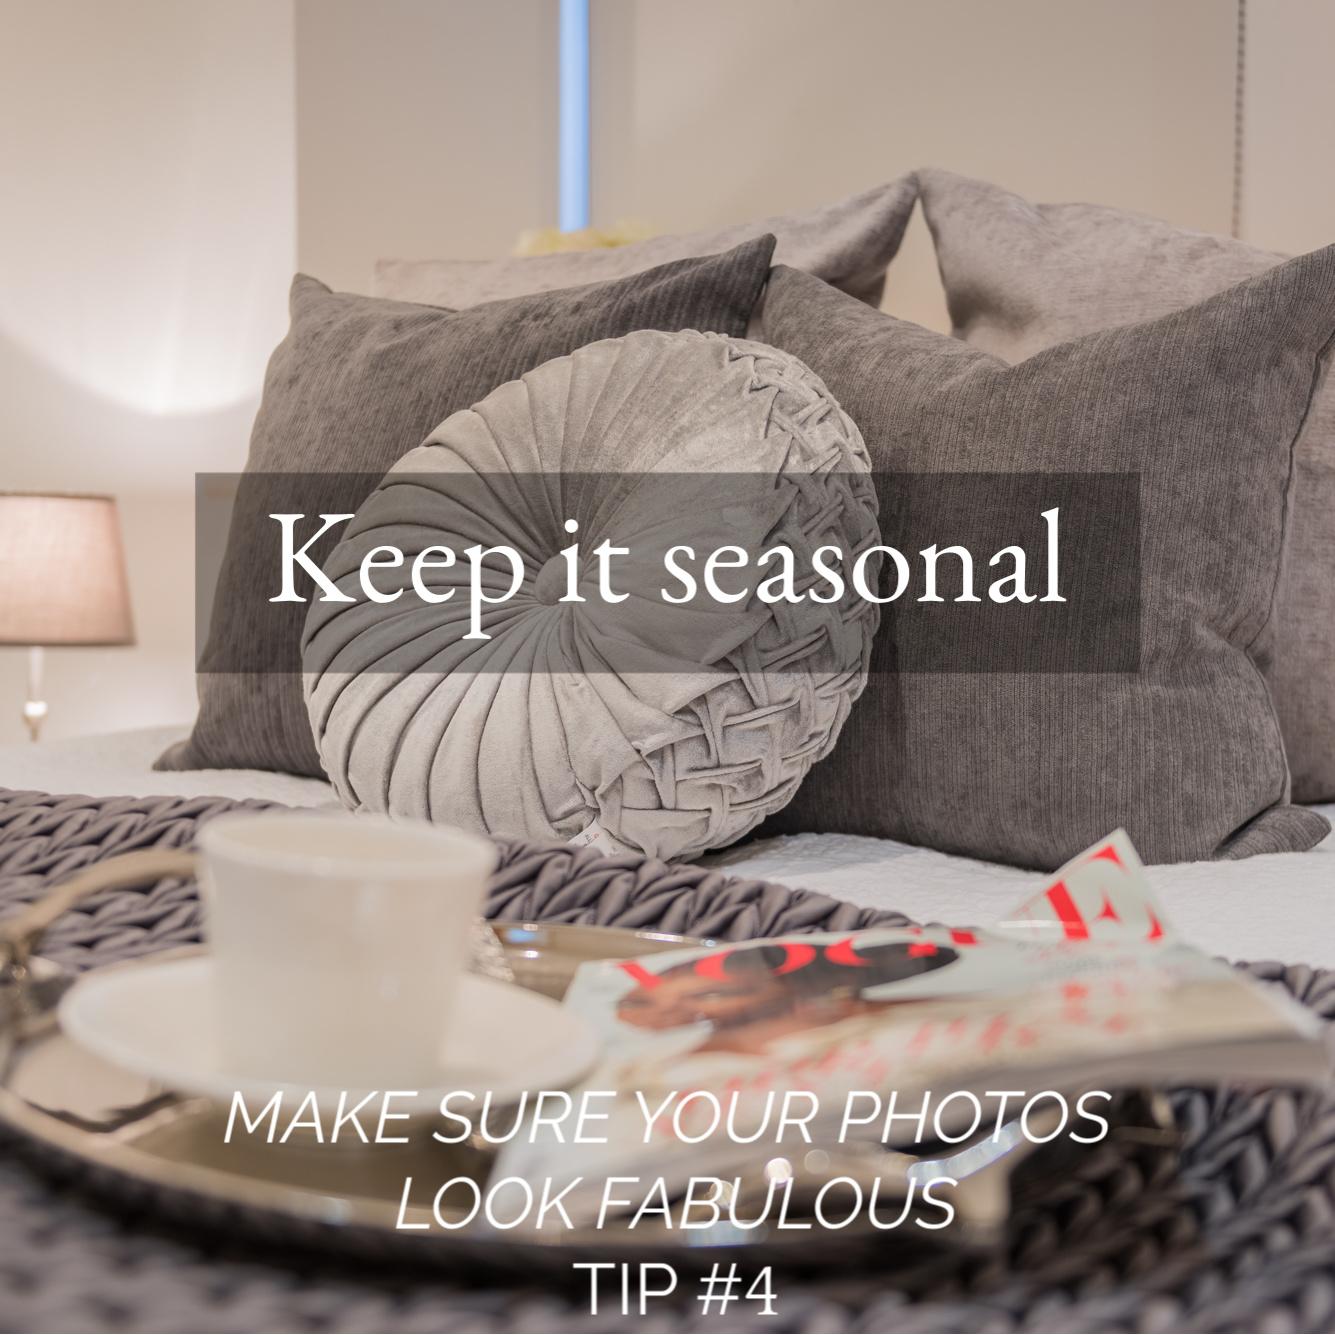 tg4-keep-it-seasonal